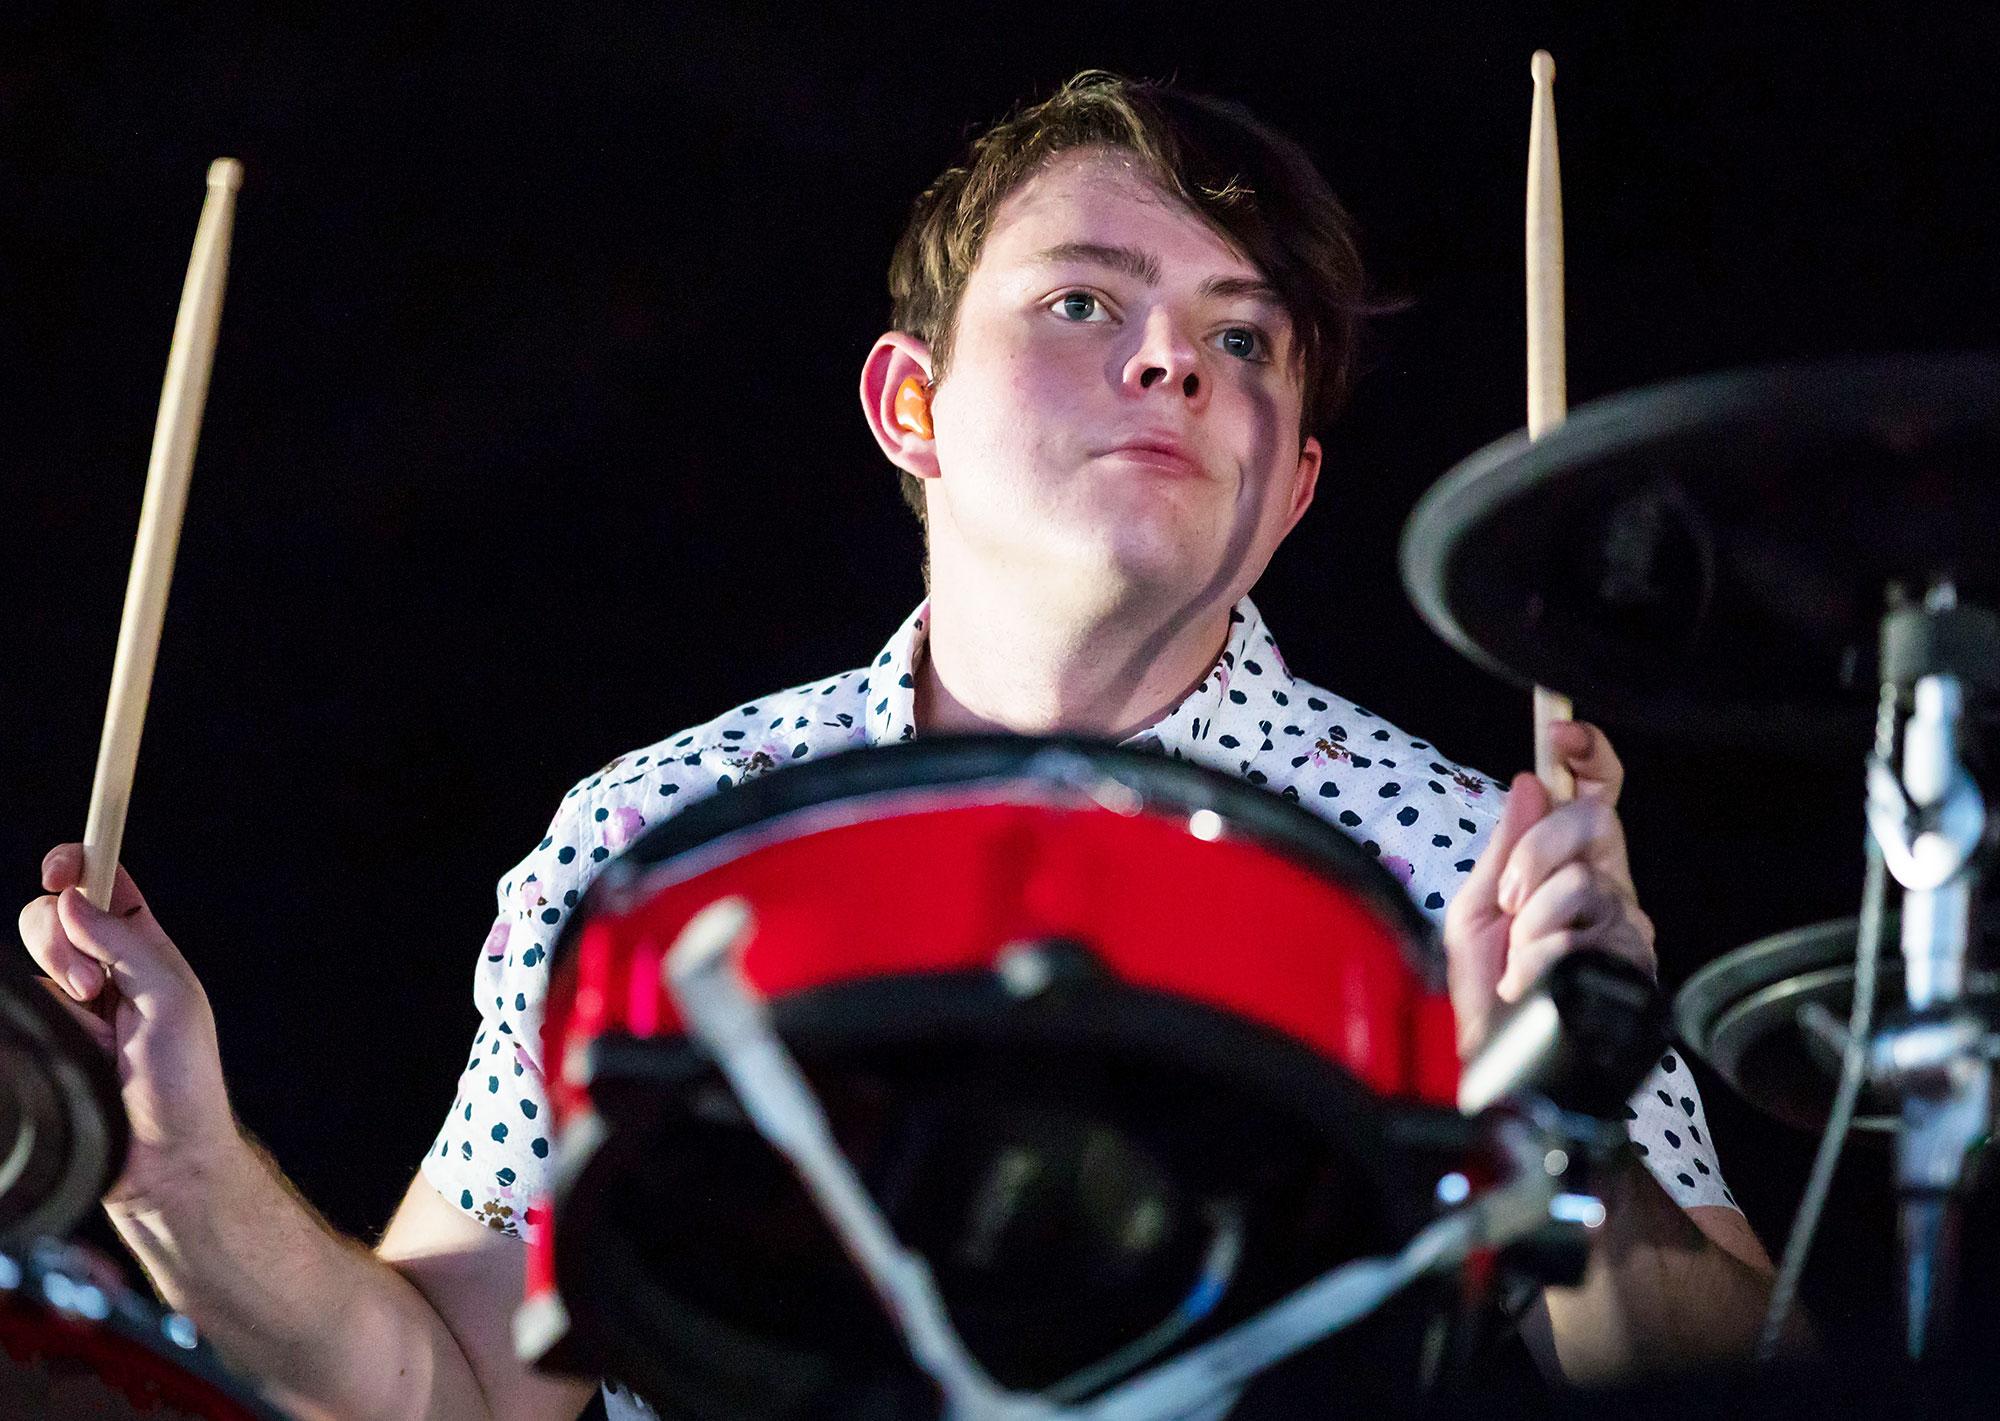 Travis Barker's Daughter Alabama Forgives Echosmith Drummer Graham Sierota for His DMs